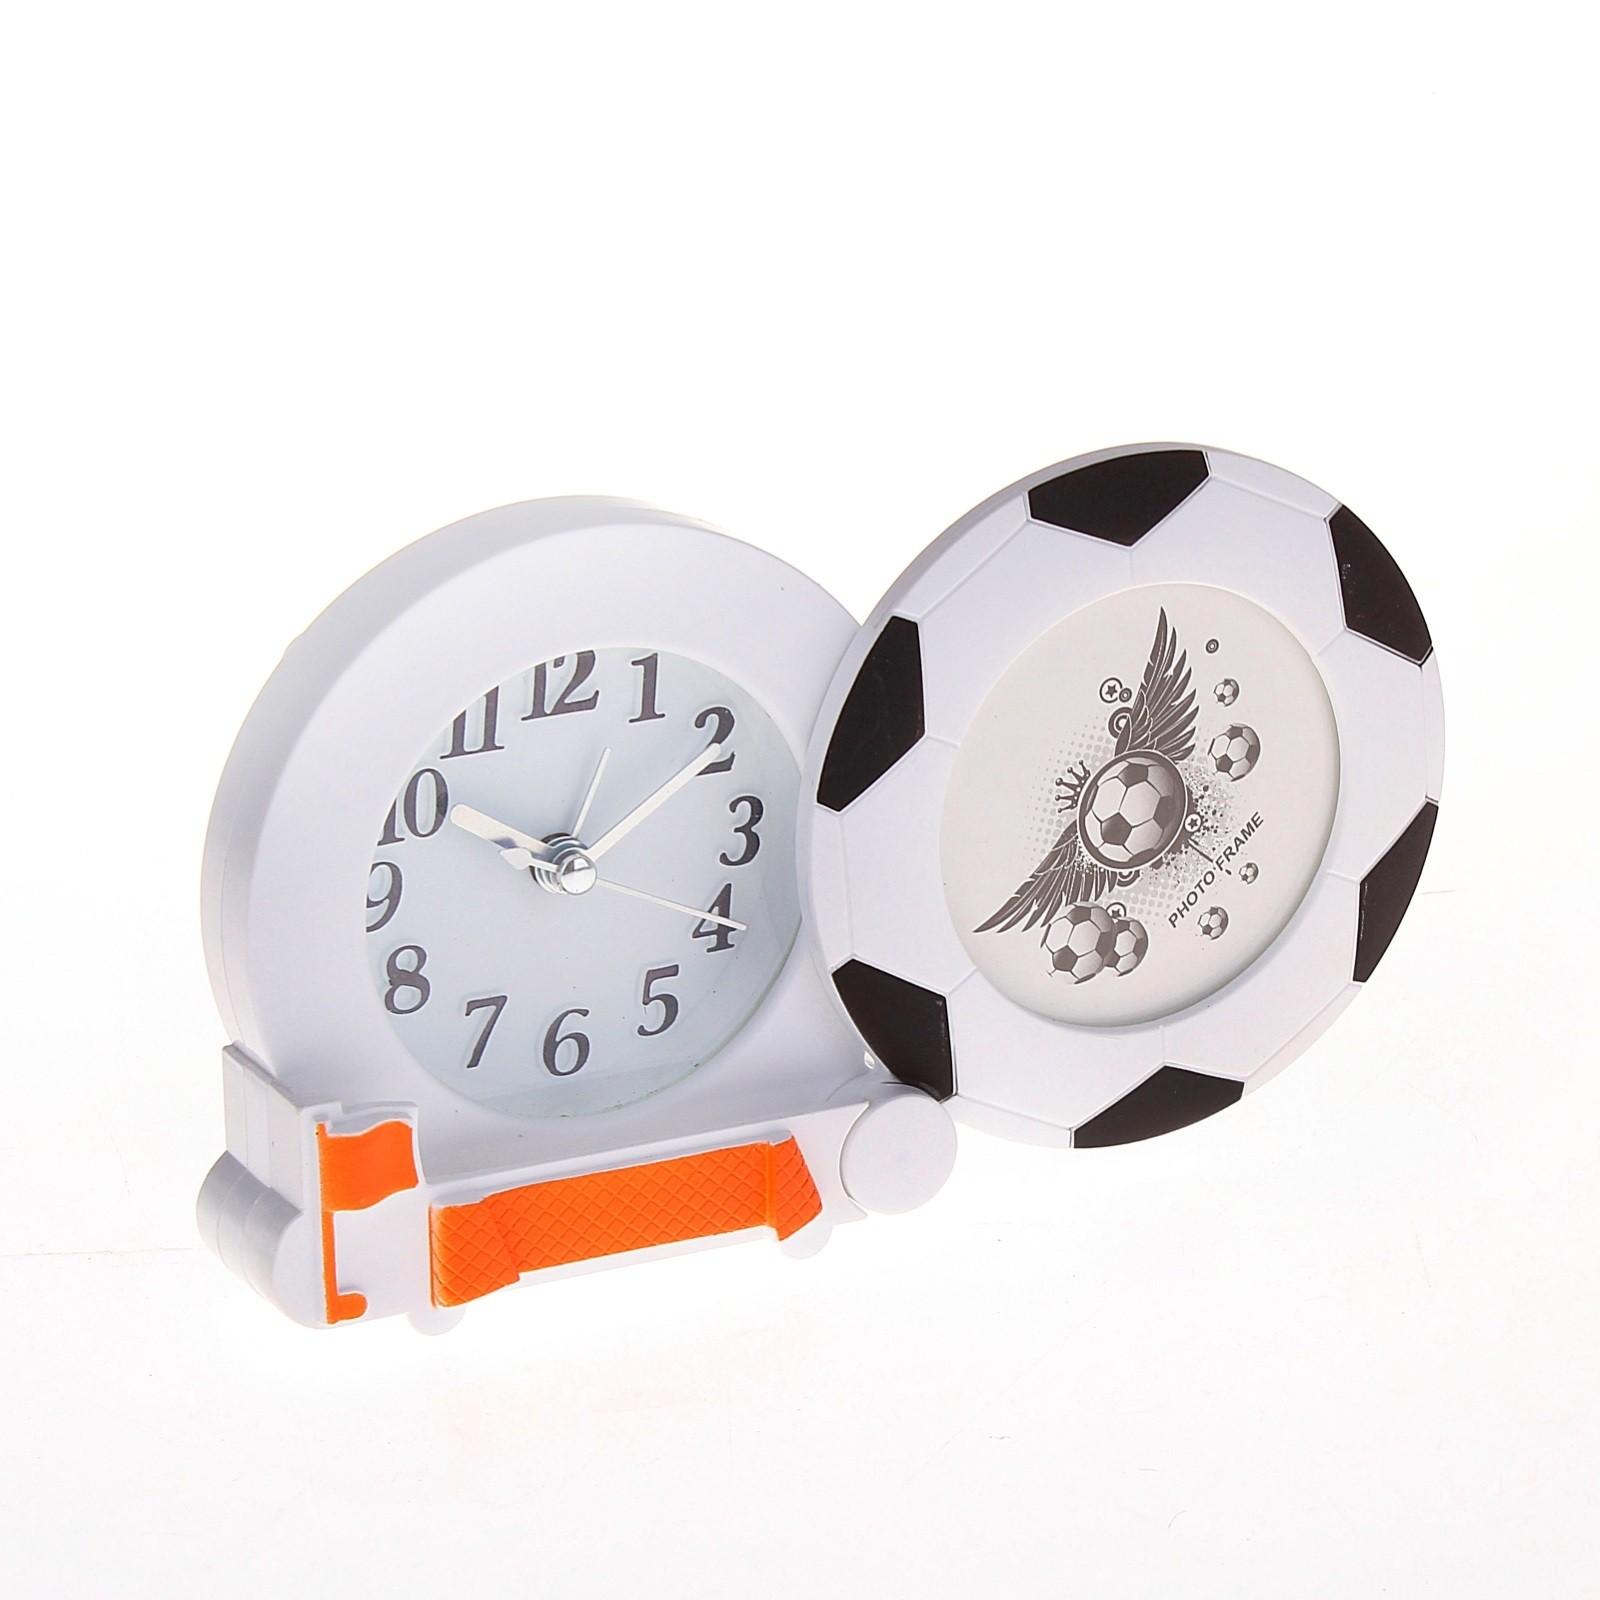 Будильник Не проспи футбол